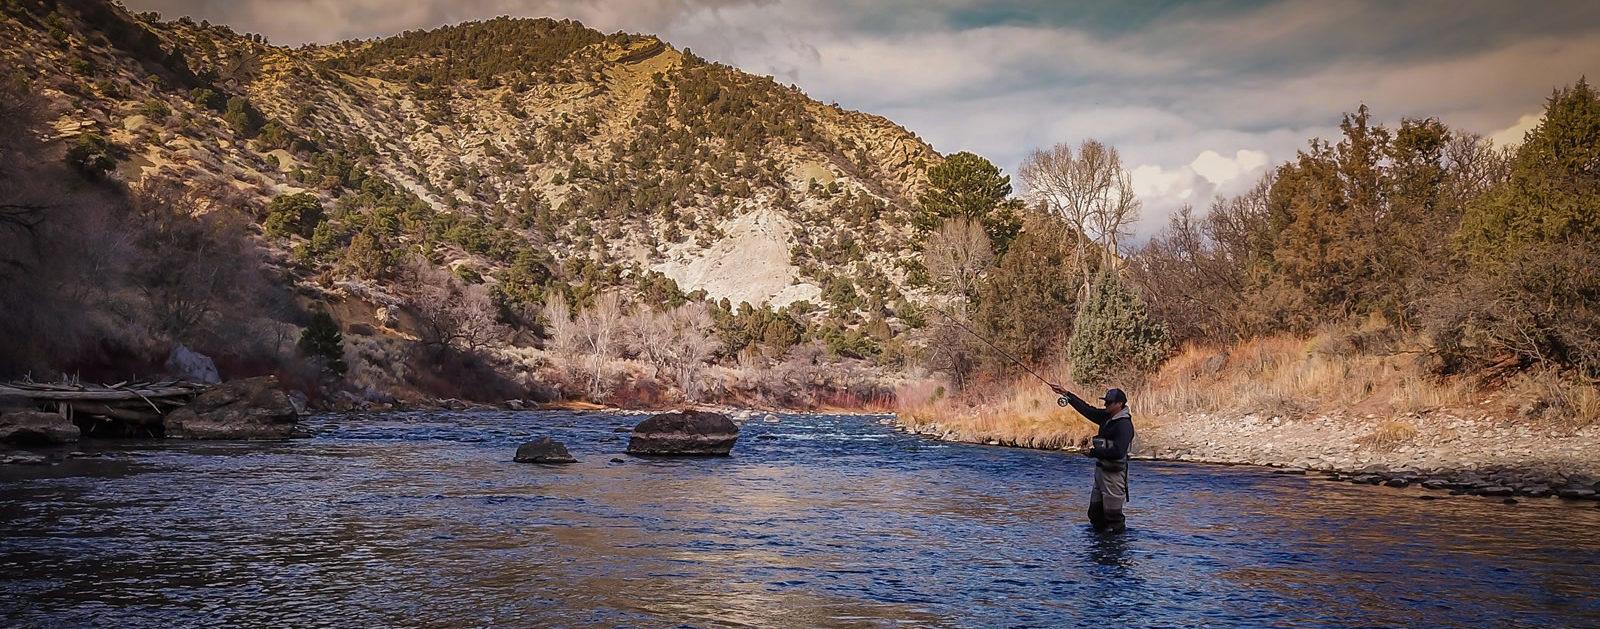 Animas River fishing | Sinjin Eberle